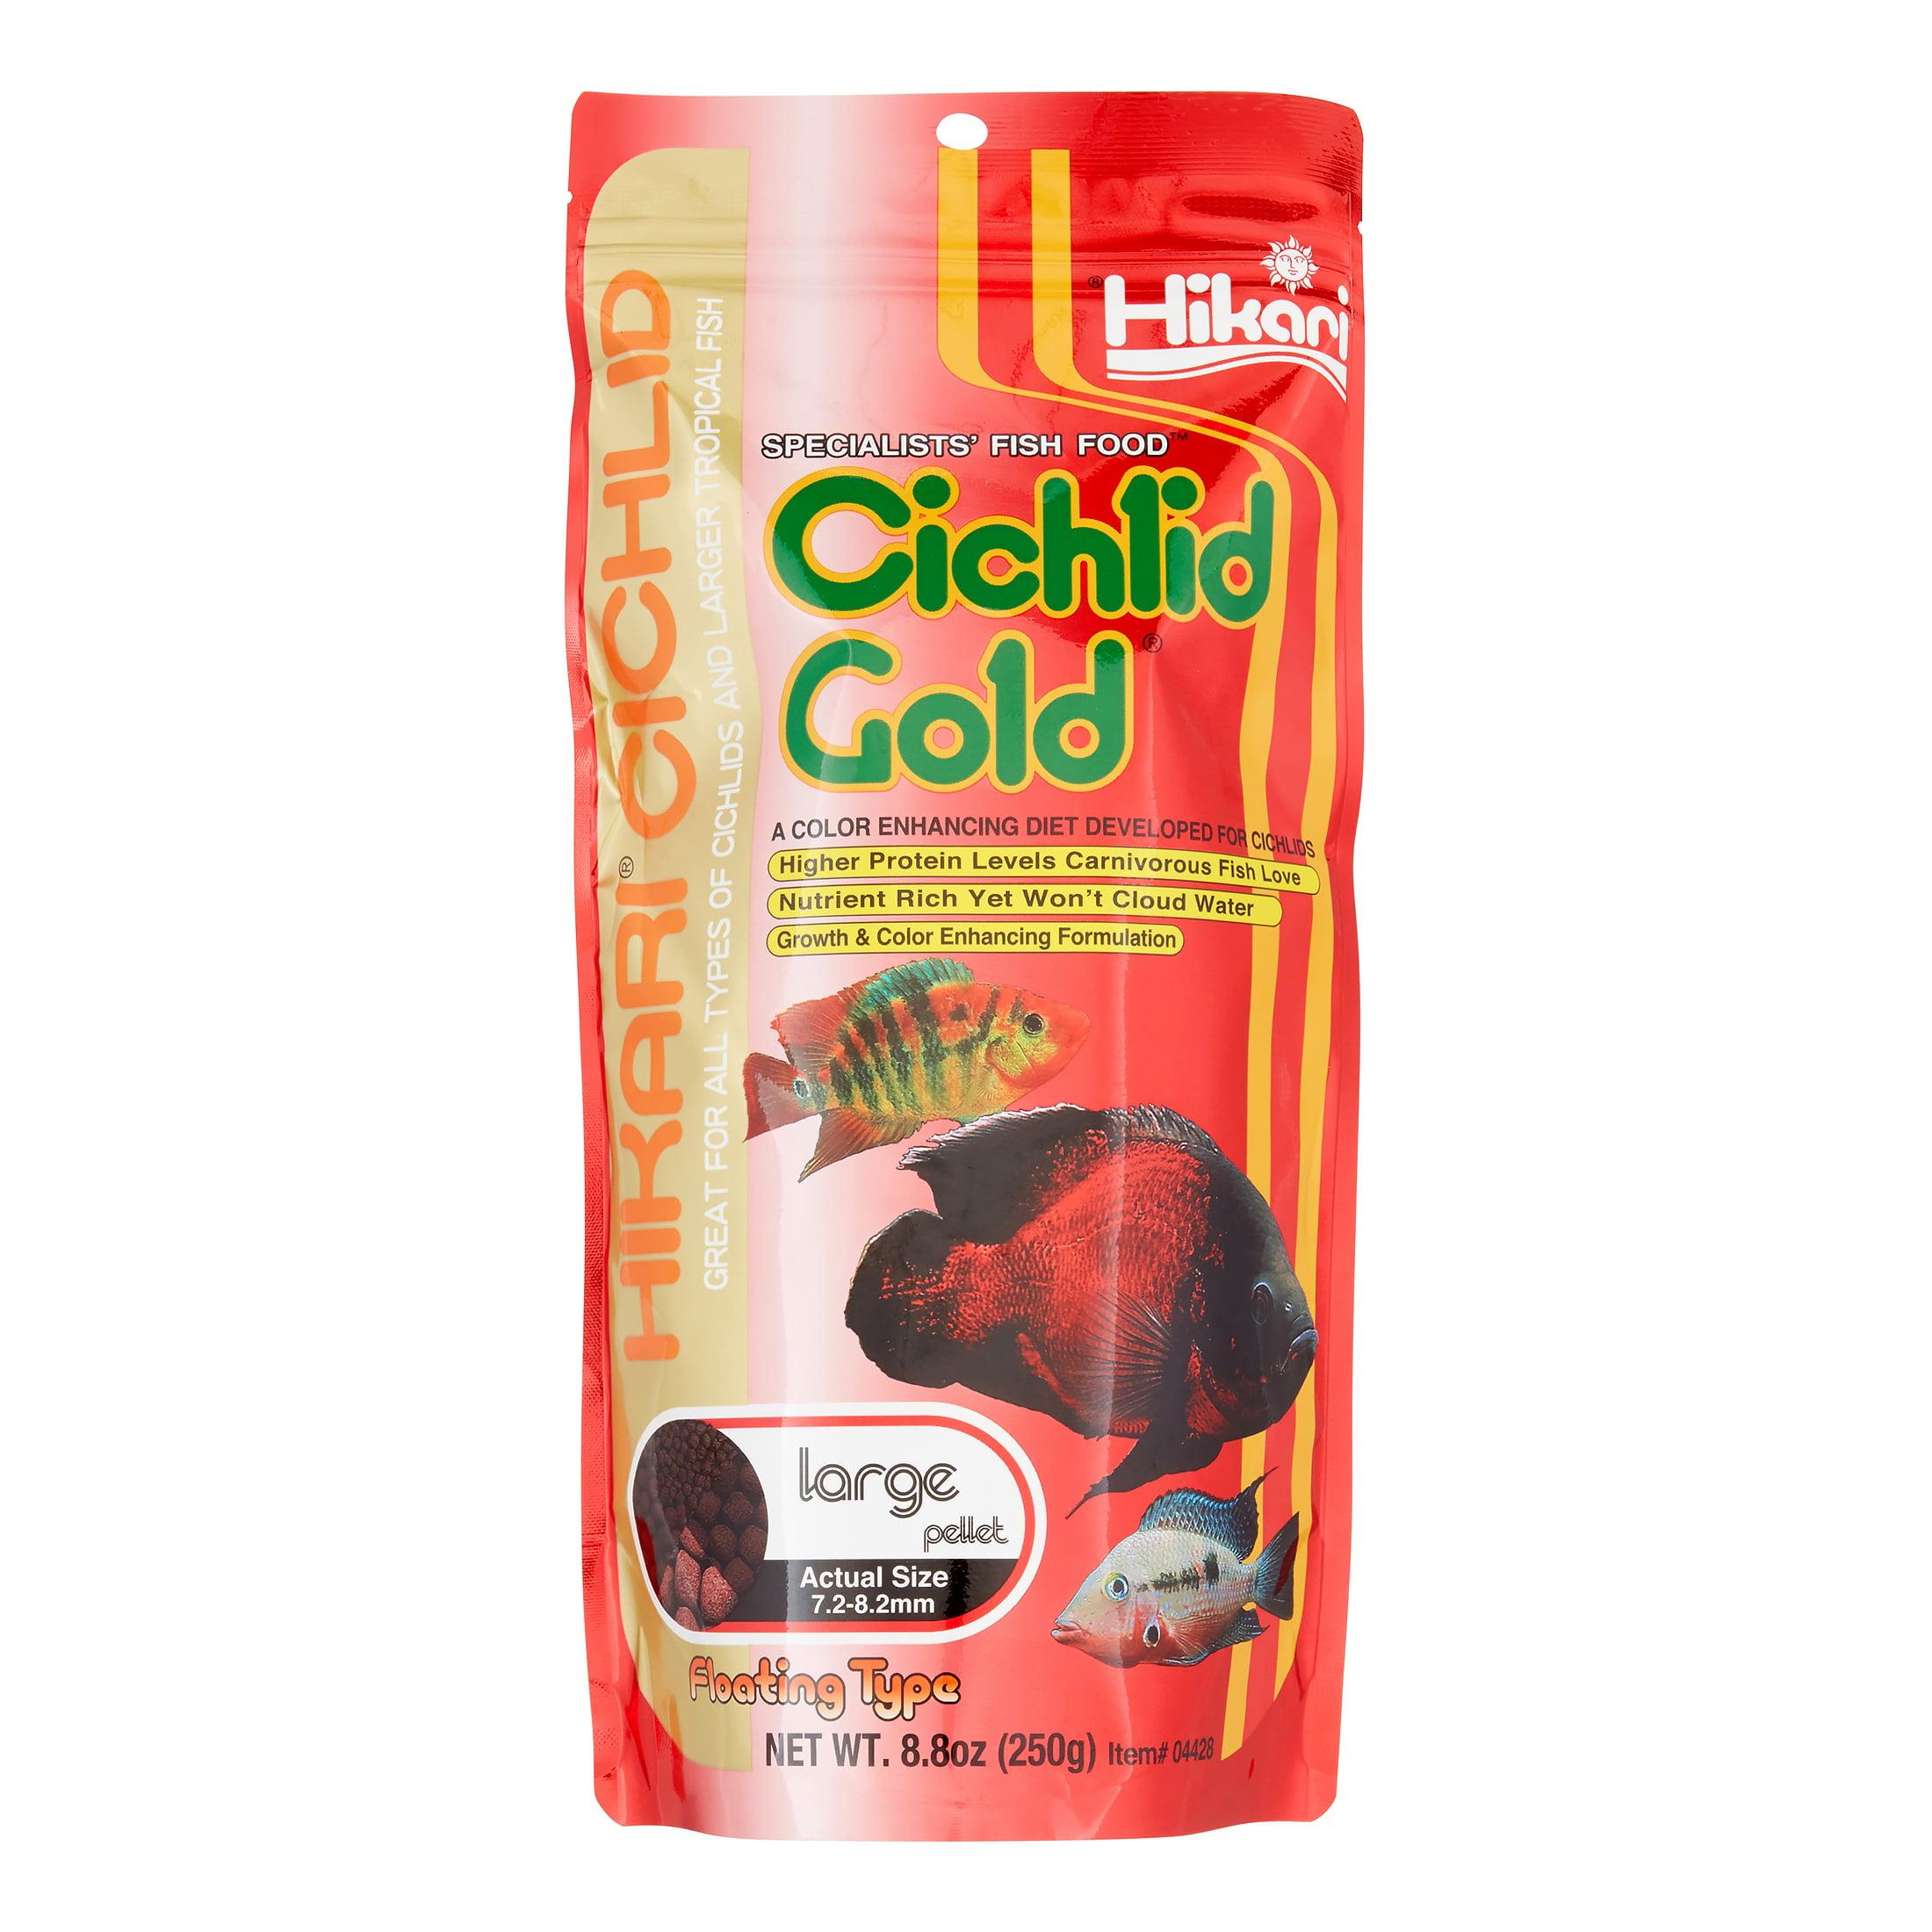 Hikari Cichlid Gold Baby Floating Pellets Freshwater Cichlid Fish Food, 8.8 Oz